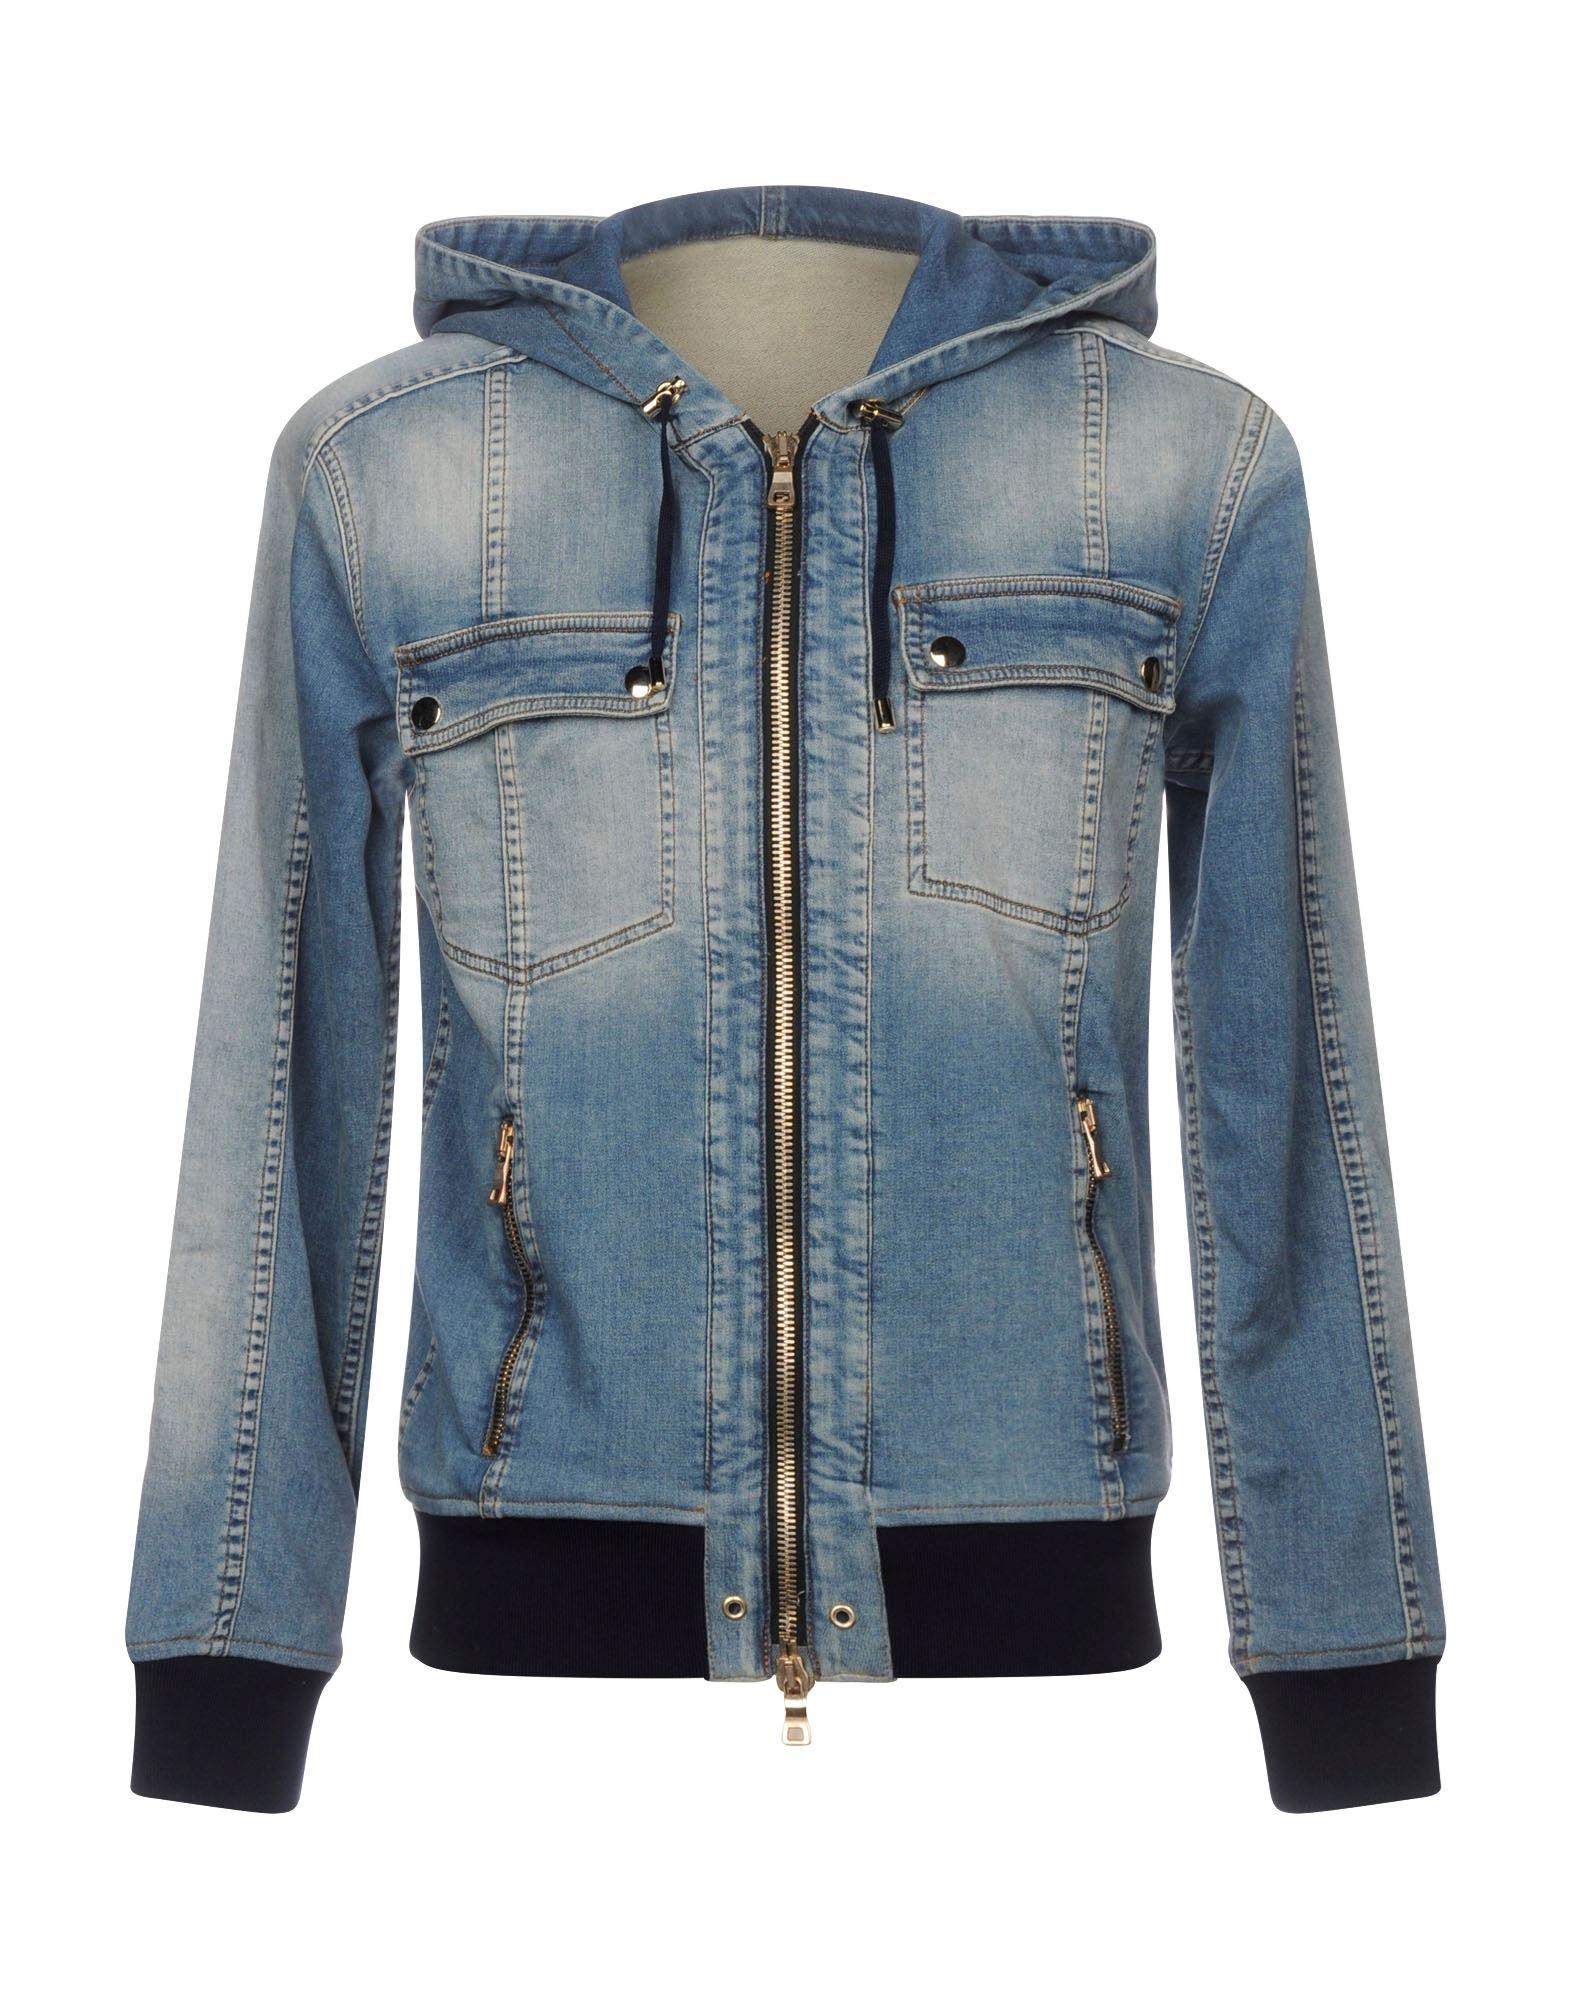 Giubbotto Jeans Balmain Uomo - Acquista online su